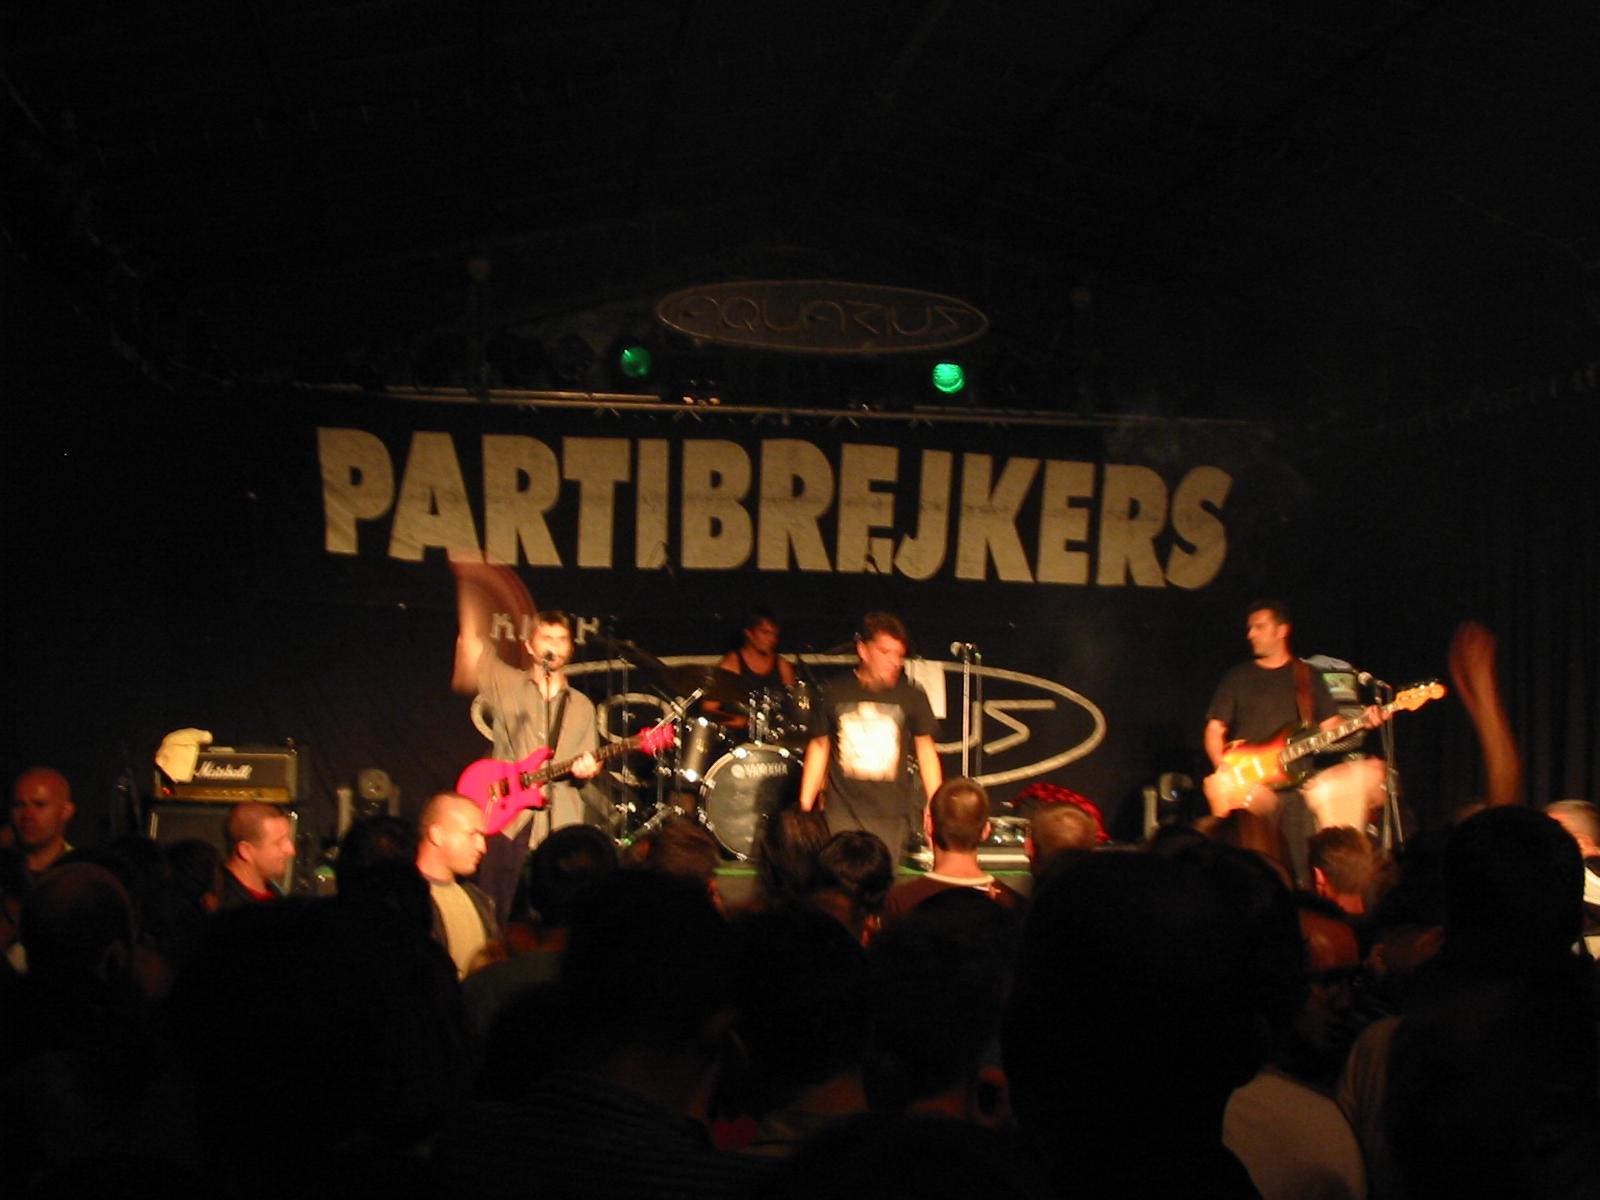 Partibrejkers2003.jpg